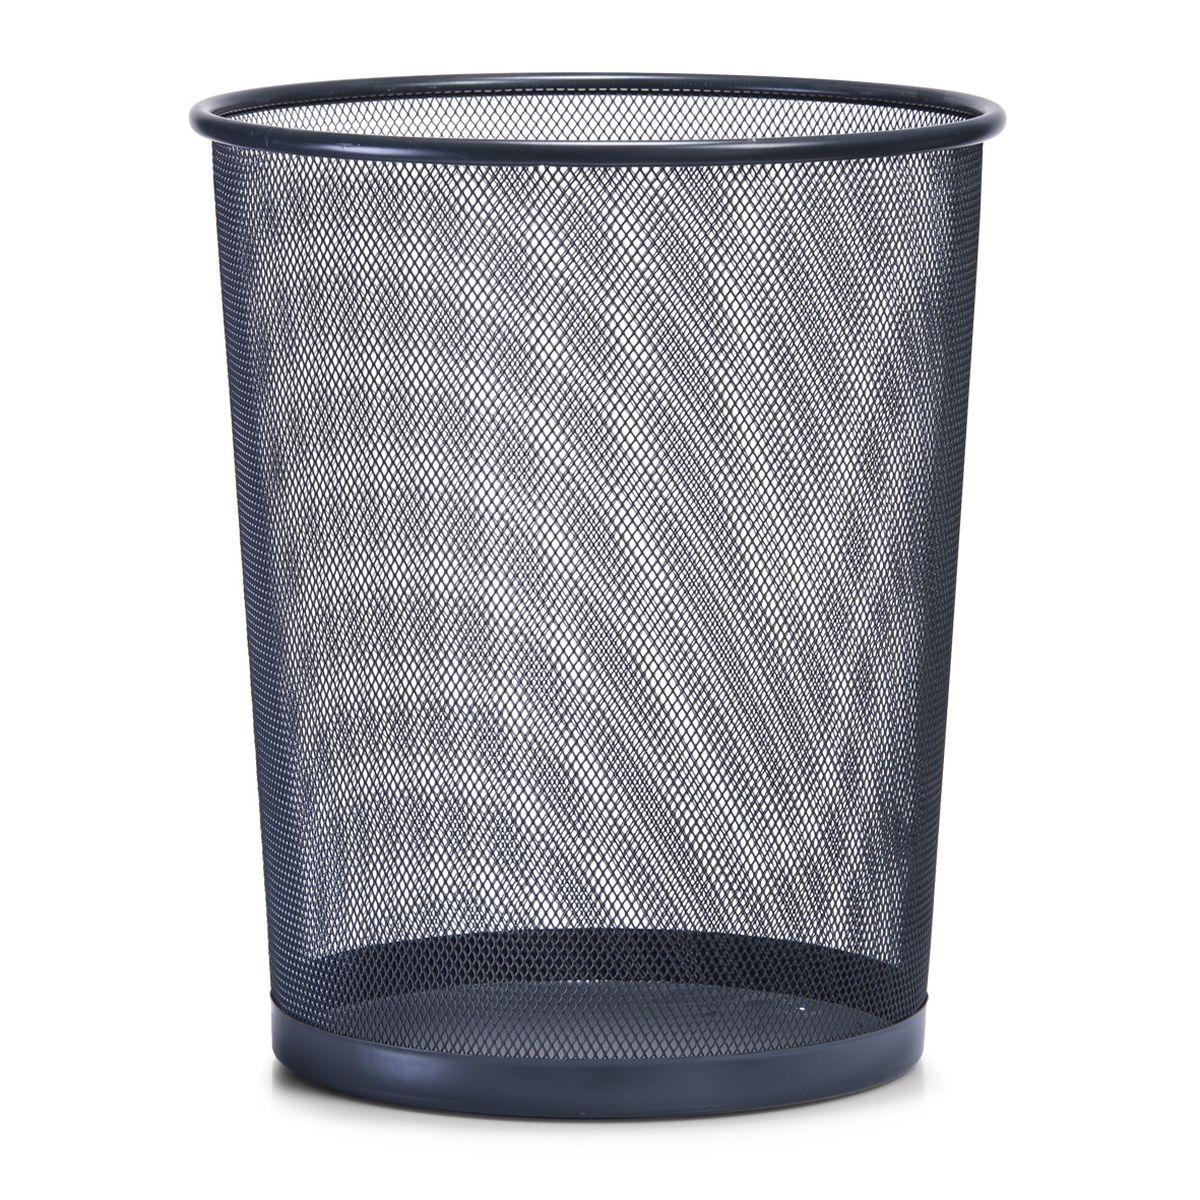 Корзина для мусора Zeller, 29,5 х 35 см17741